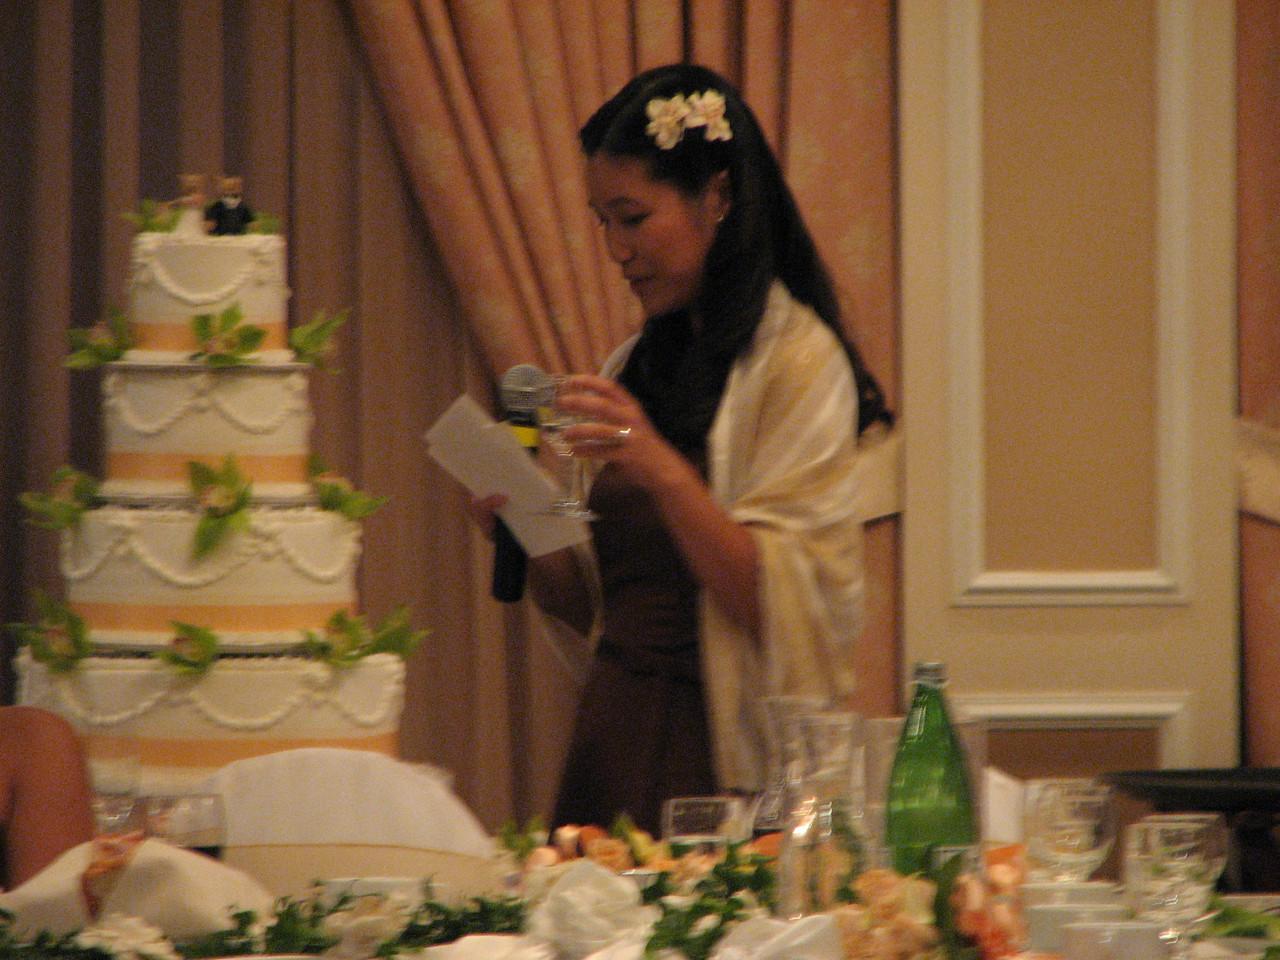 2007 06 09 Sat - Bridesmatron toast - Hege Fan